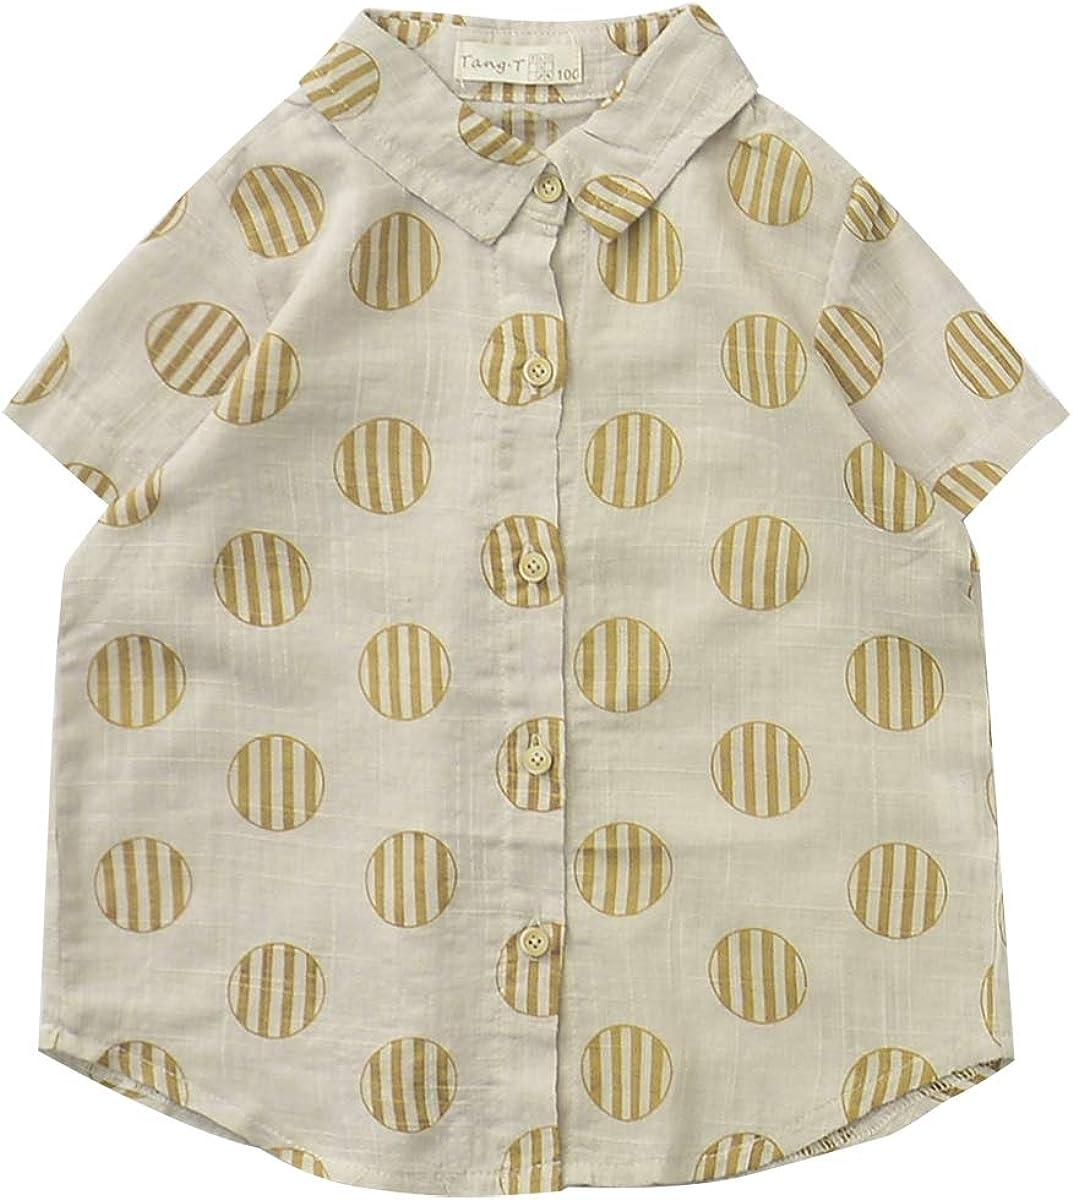 Mason Island Toddler Kids Boys Girl' Short Sleeve Button Down Shirt with Pattern